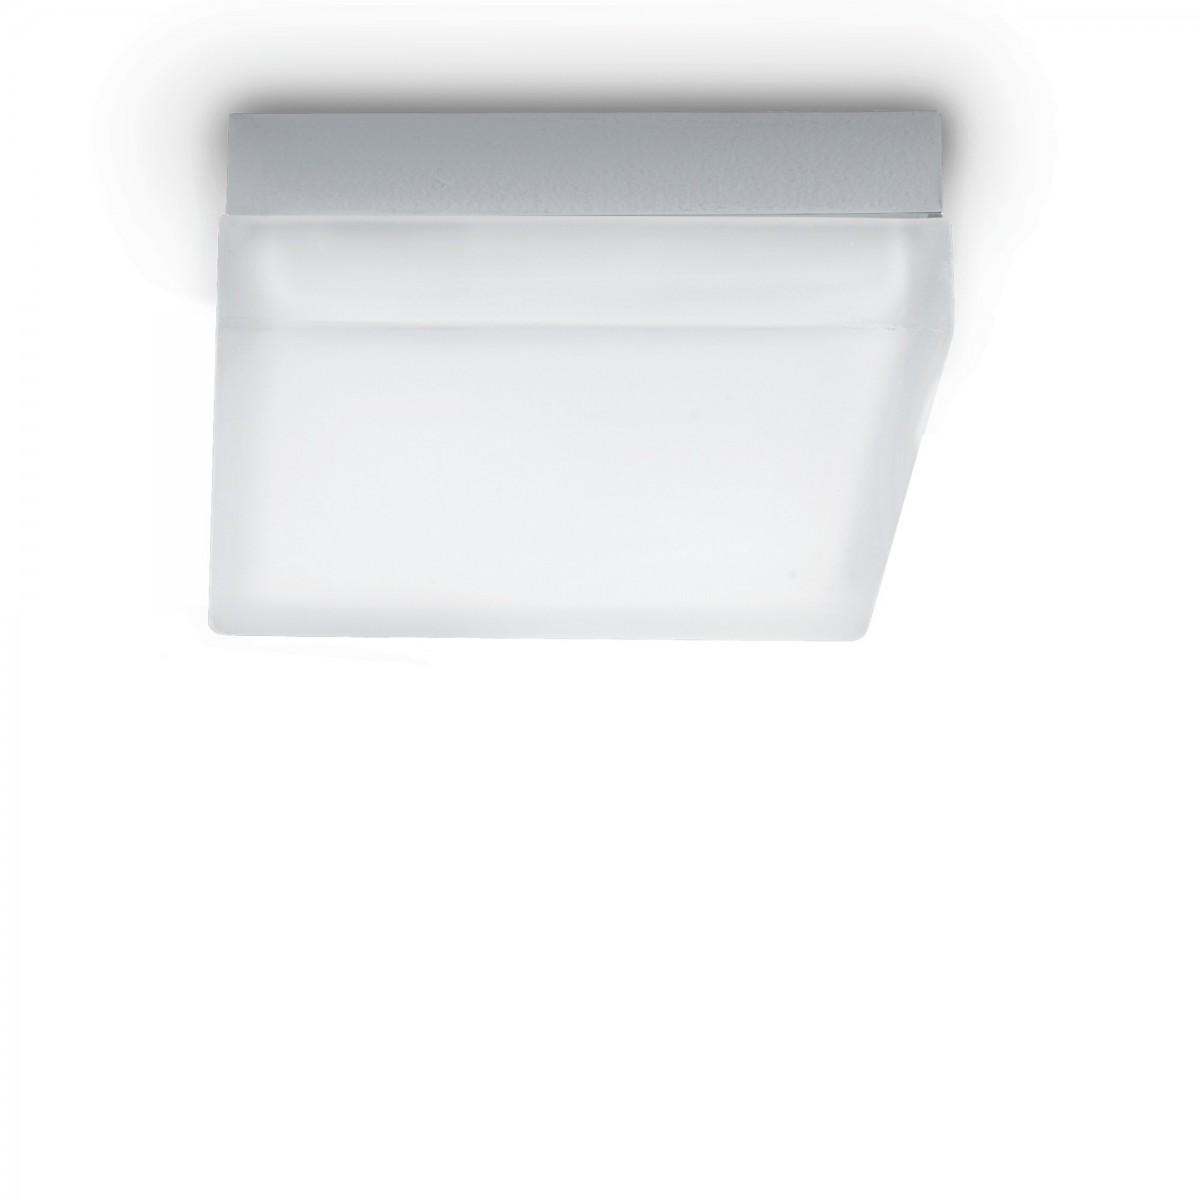 LED stropní svítidlo Ideal lux Iris PL1 104546 1x7W GX53 - jednoduchá elegance